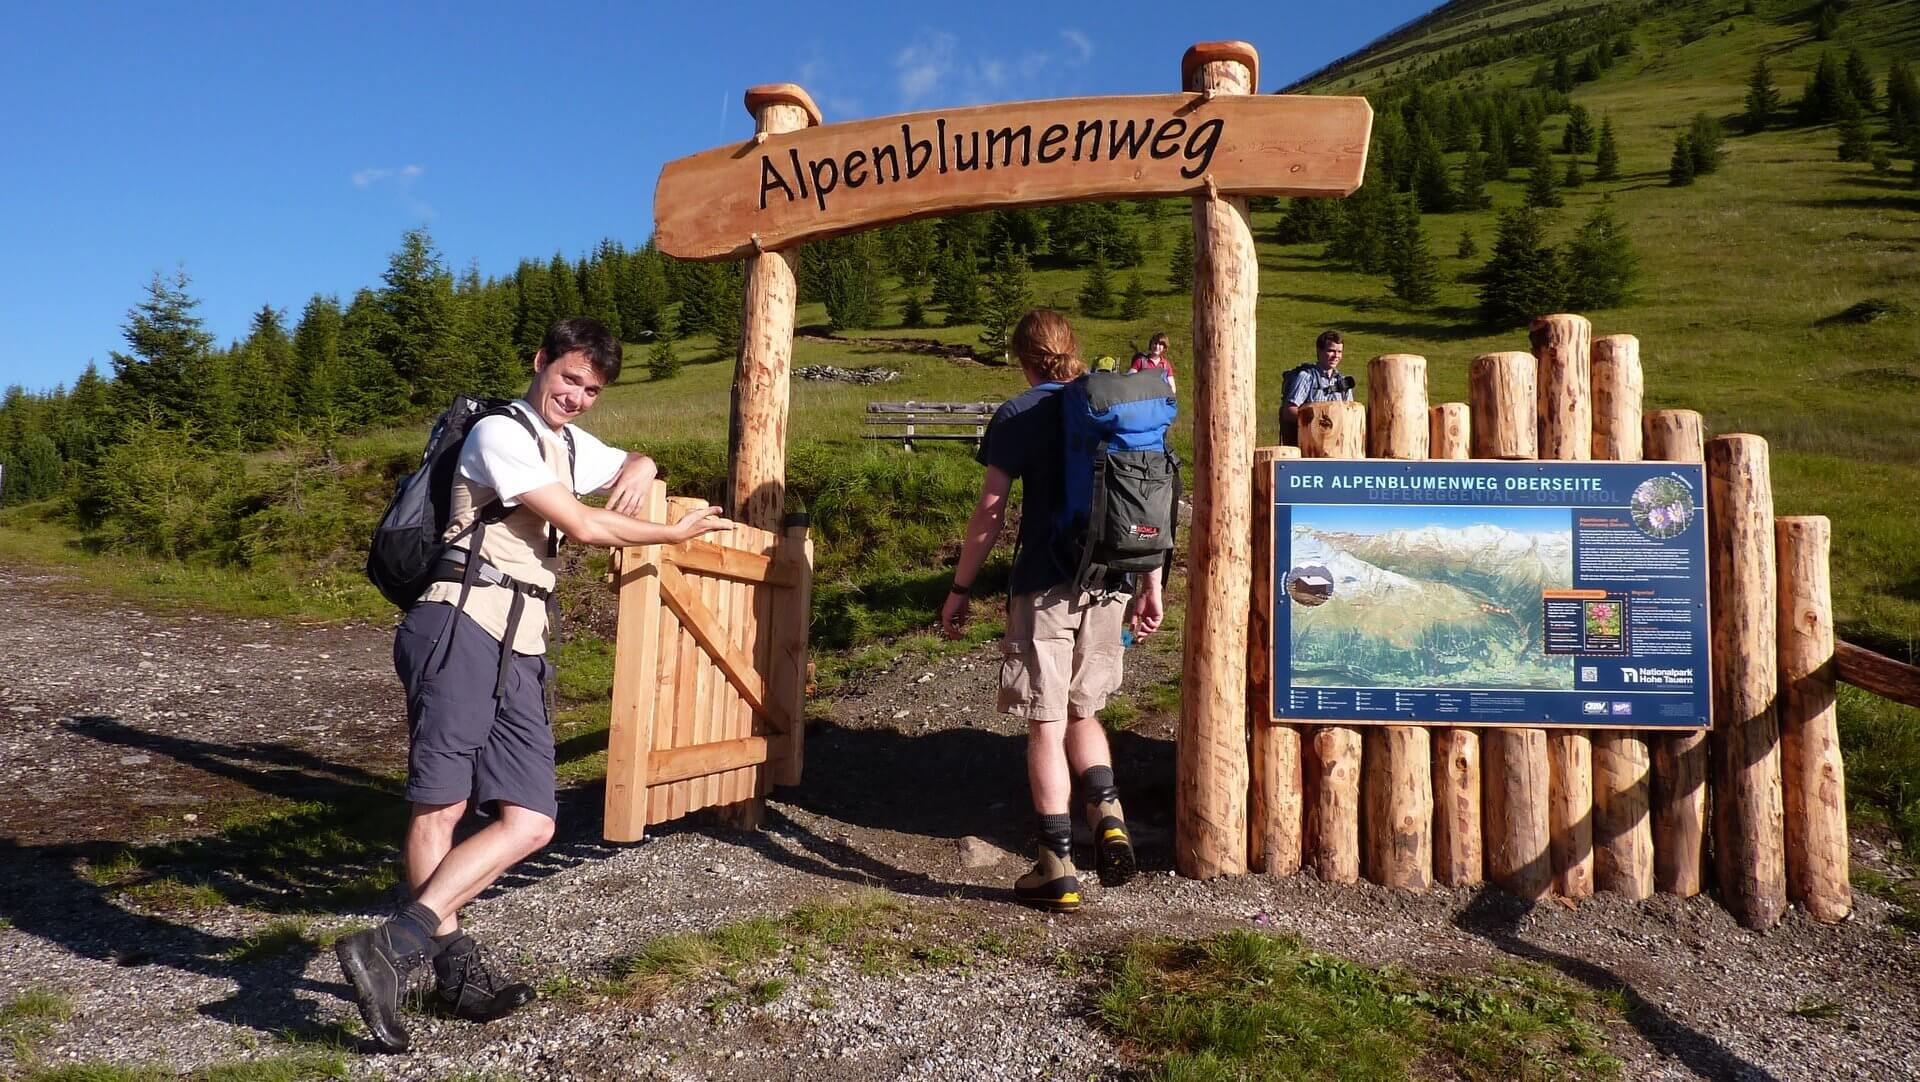 Alpenblumenweg St. Jakob im Defereggental